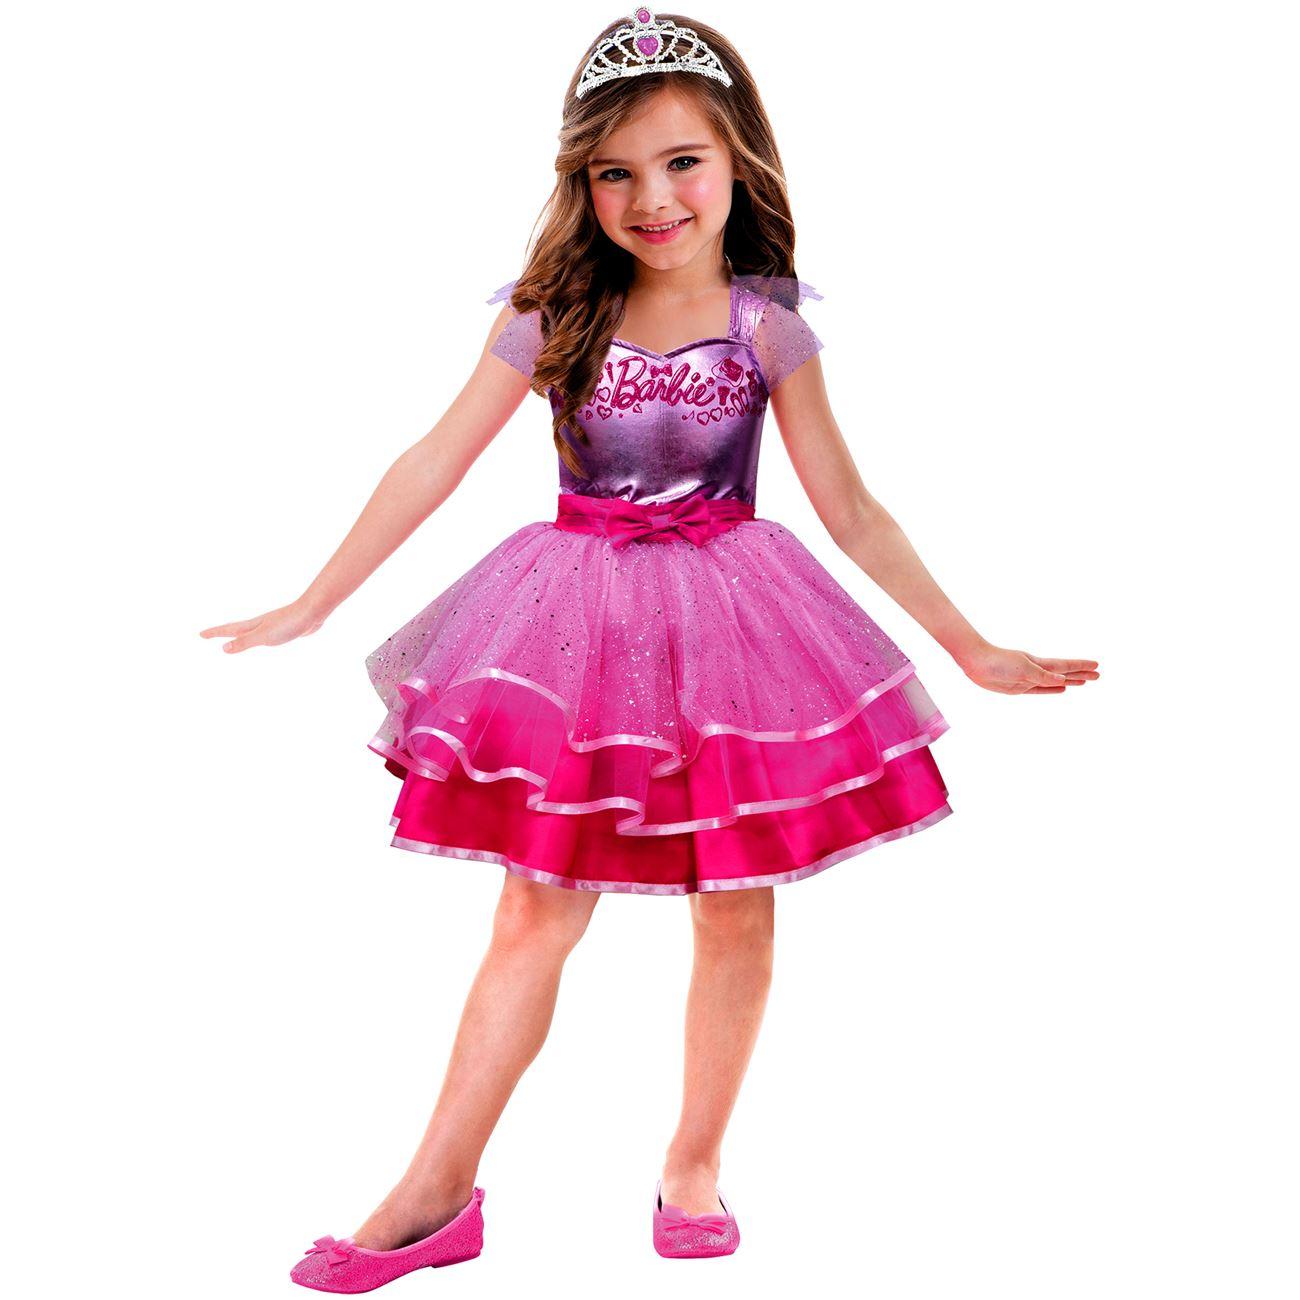 bd0c074ea74 Αποκριάτικη Στολή BARBIE Μπαλαρίνα < Στολές Barbie | Jumbo